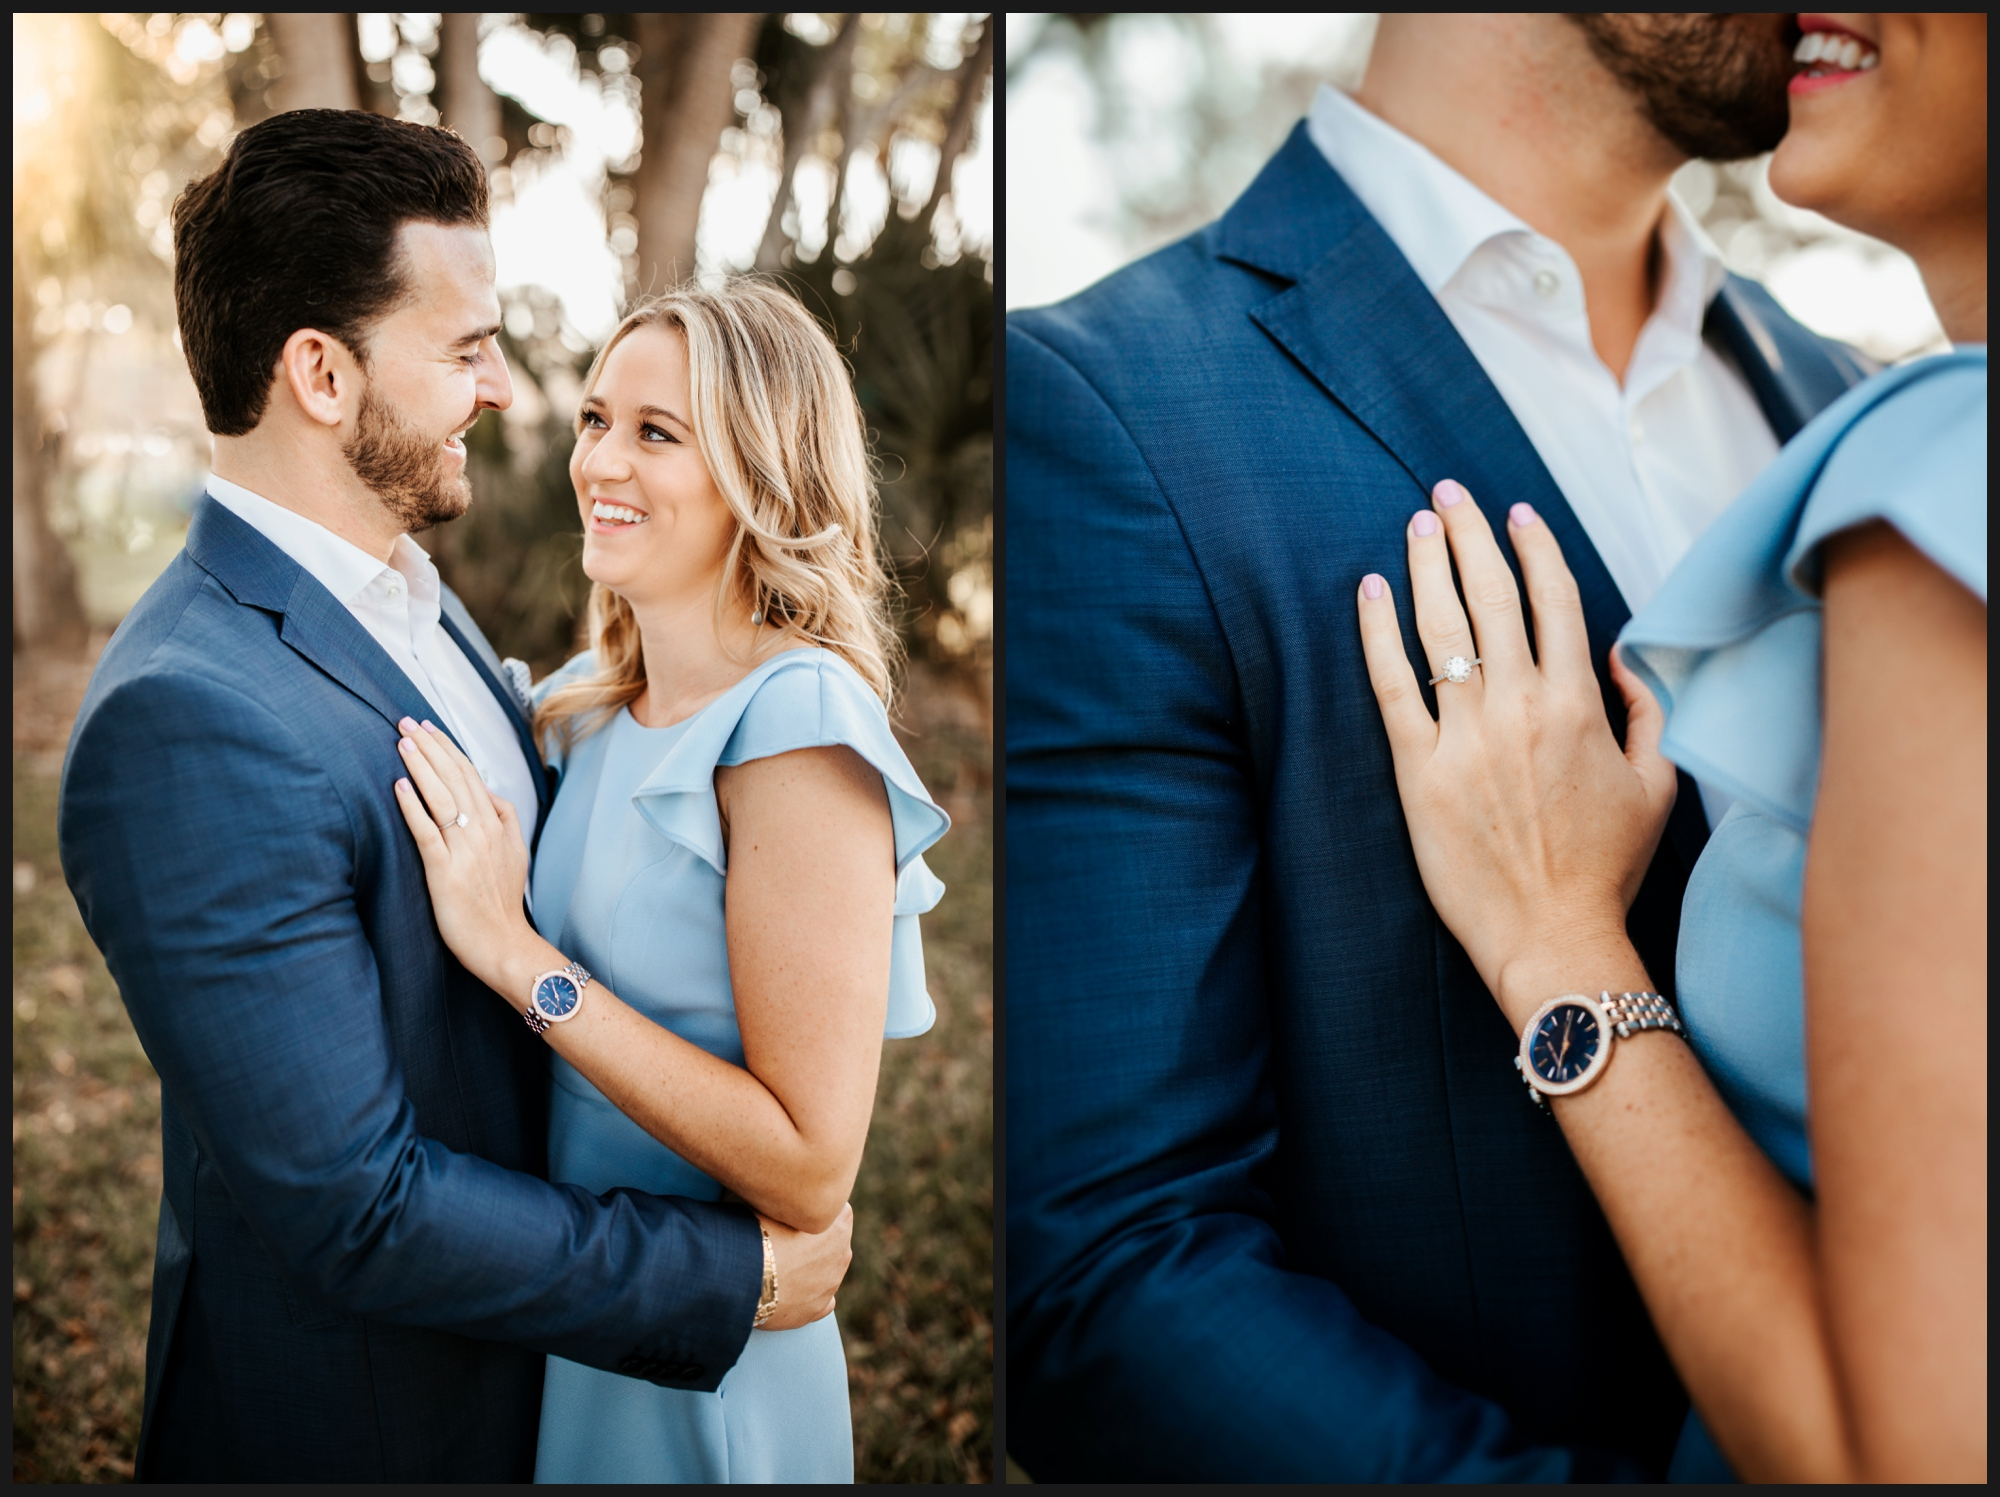 Orlando-Wedding-Photographer-destination-wedding-photographer-florida-wedding-photographer-bohemian-wedding-photographer_1655.jpg